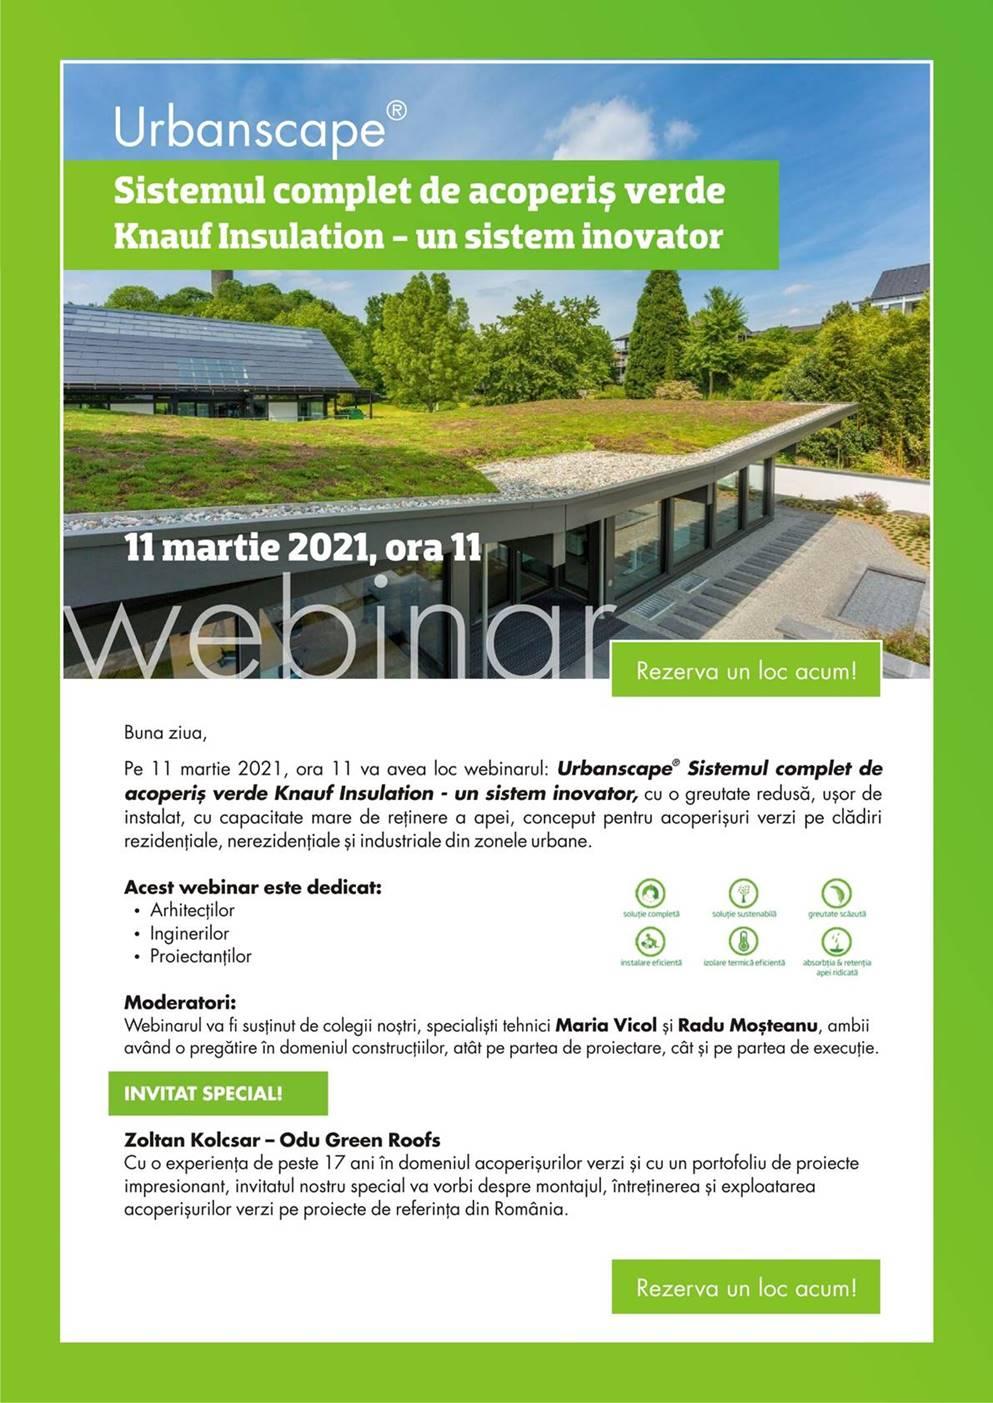 Webinar: Soluții pentru acoperișuri verzi – Urbanscape